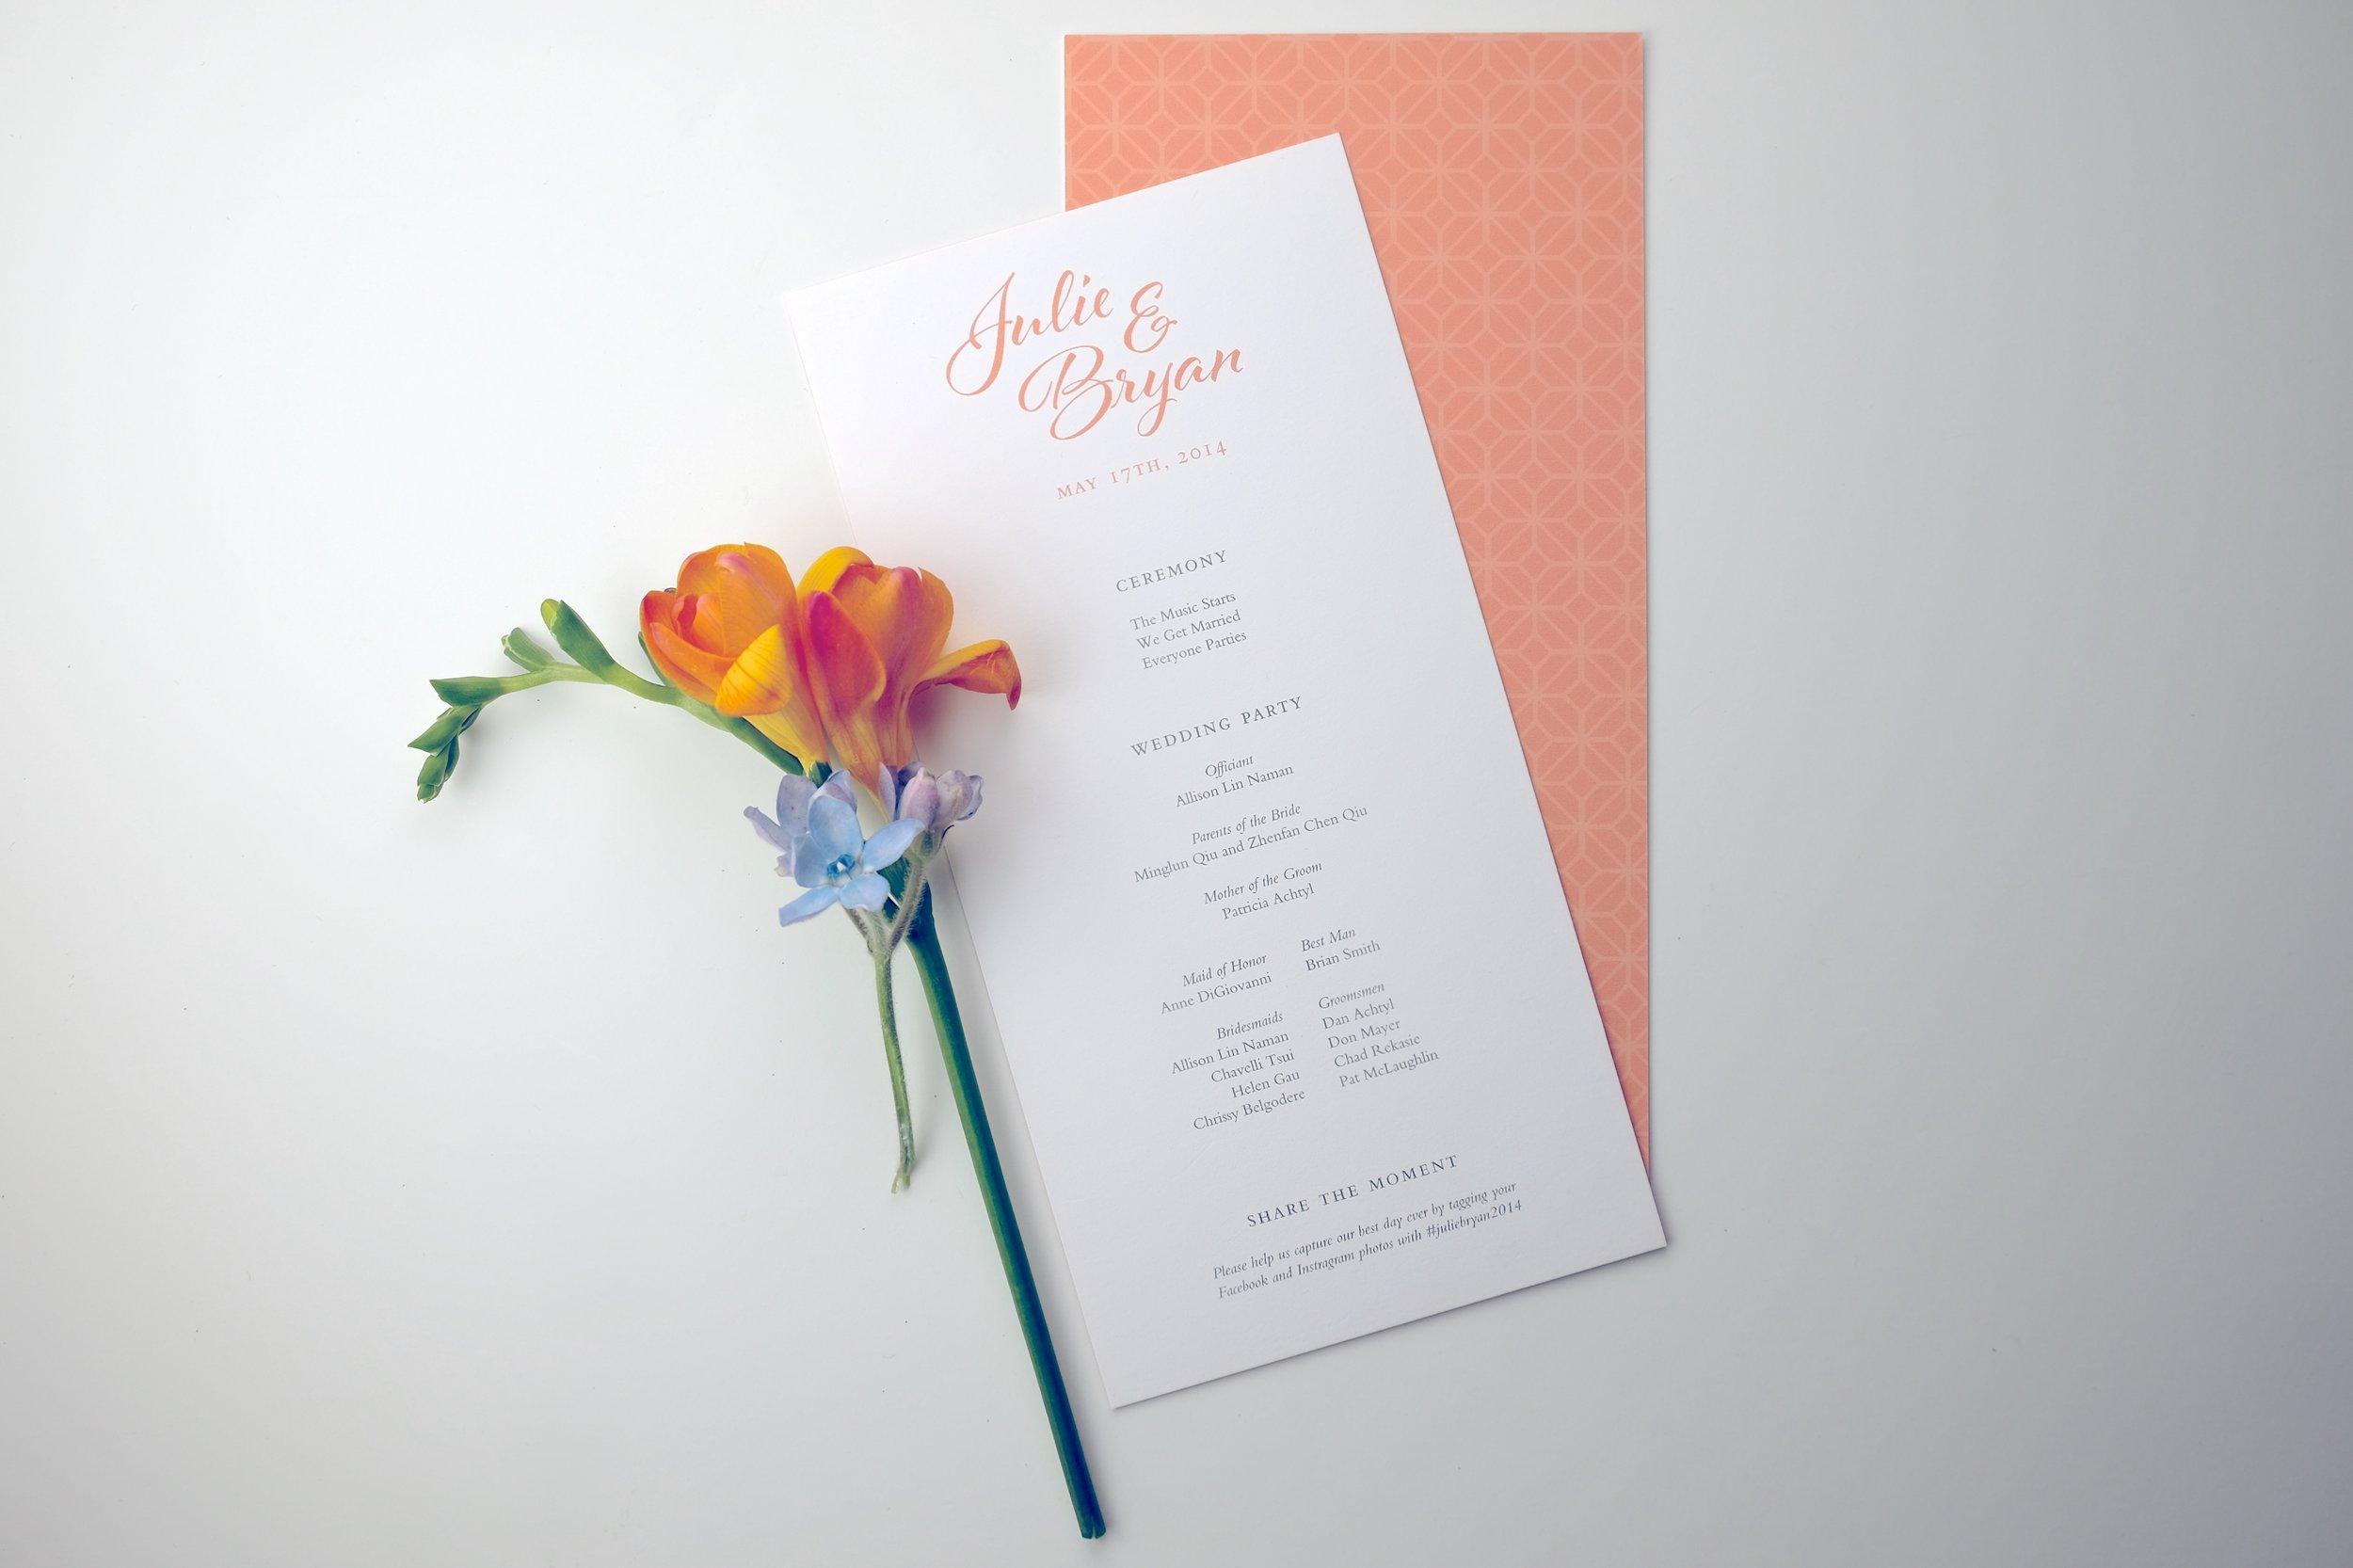 Custom designed wedding ceremony program by Studio Chavelli www.chavelli.com